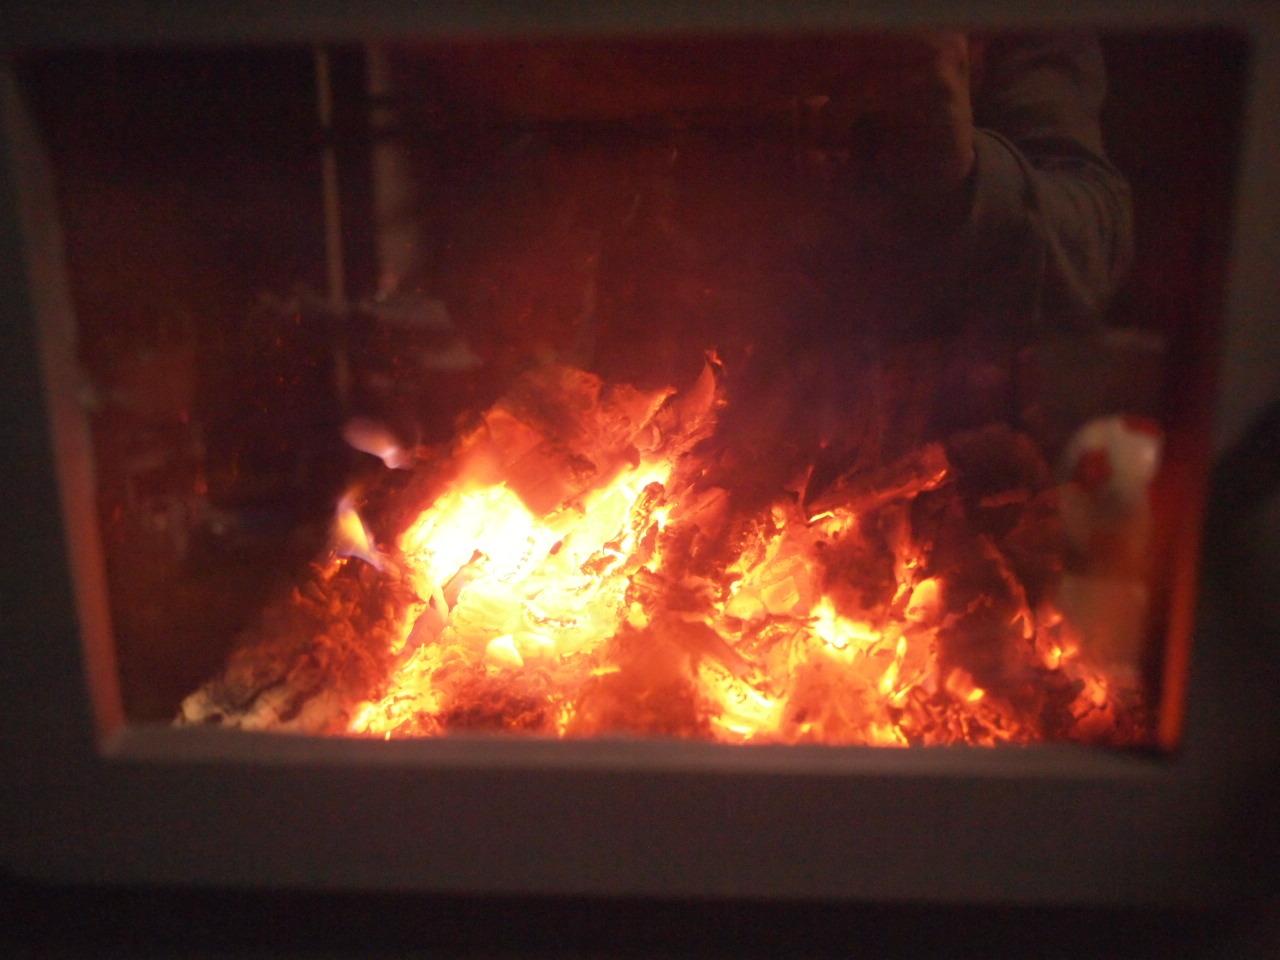 kintoku-stoveの焚き付けの仕方。_a0206732_20030447.jpg